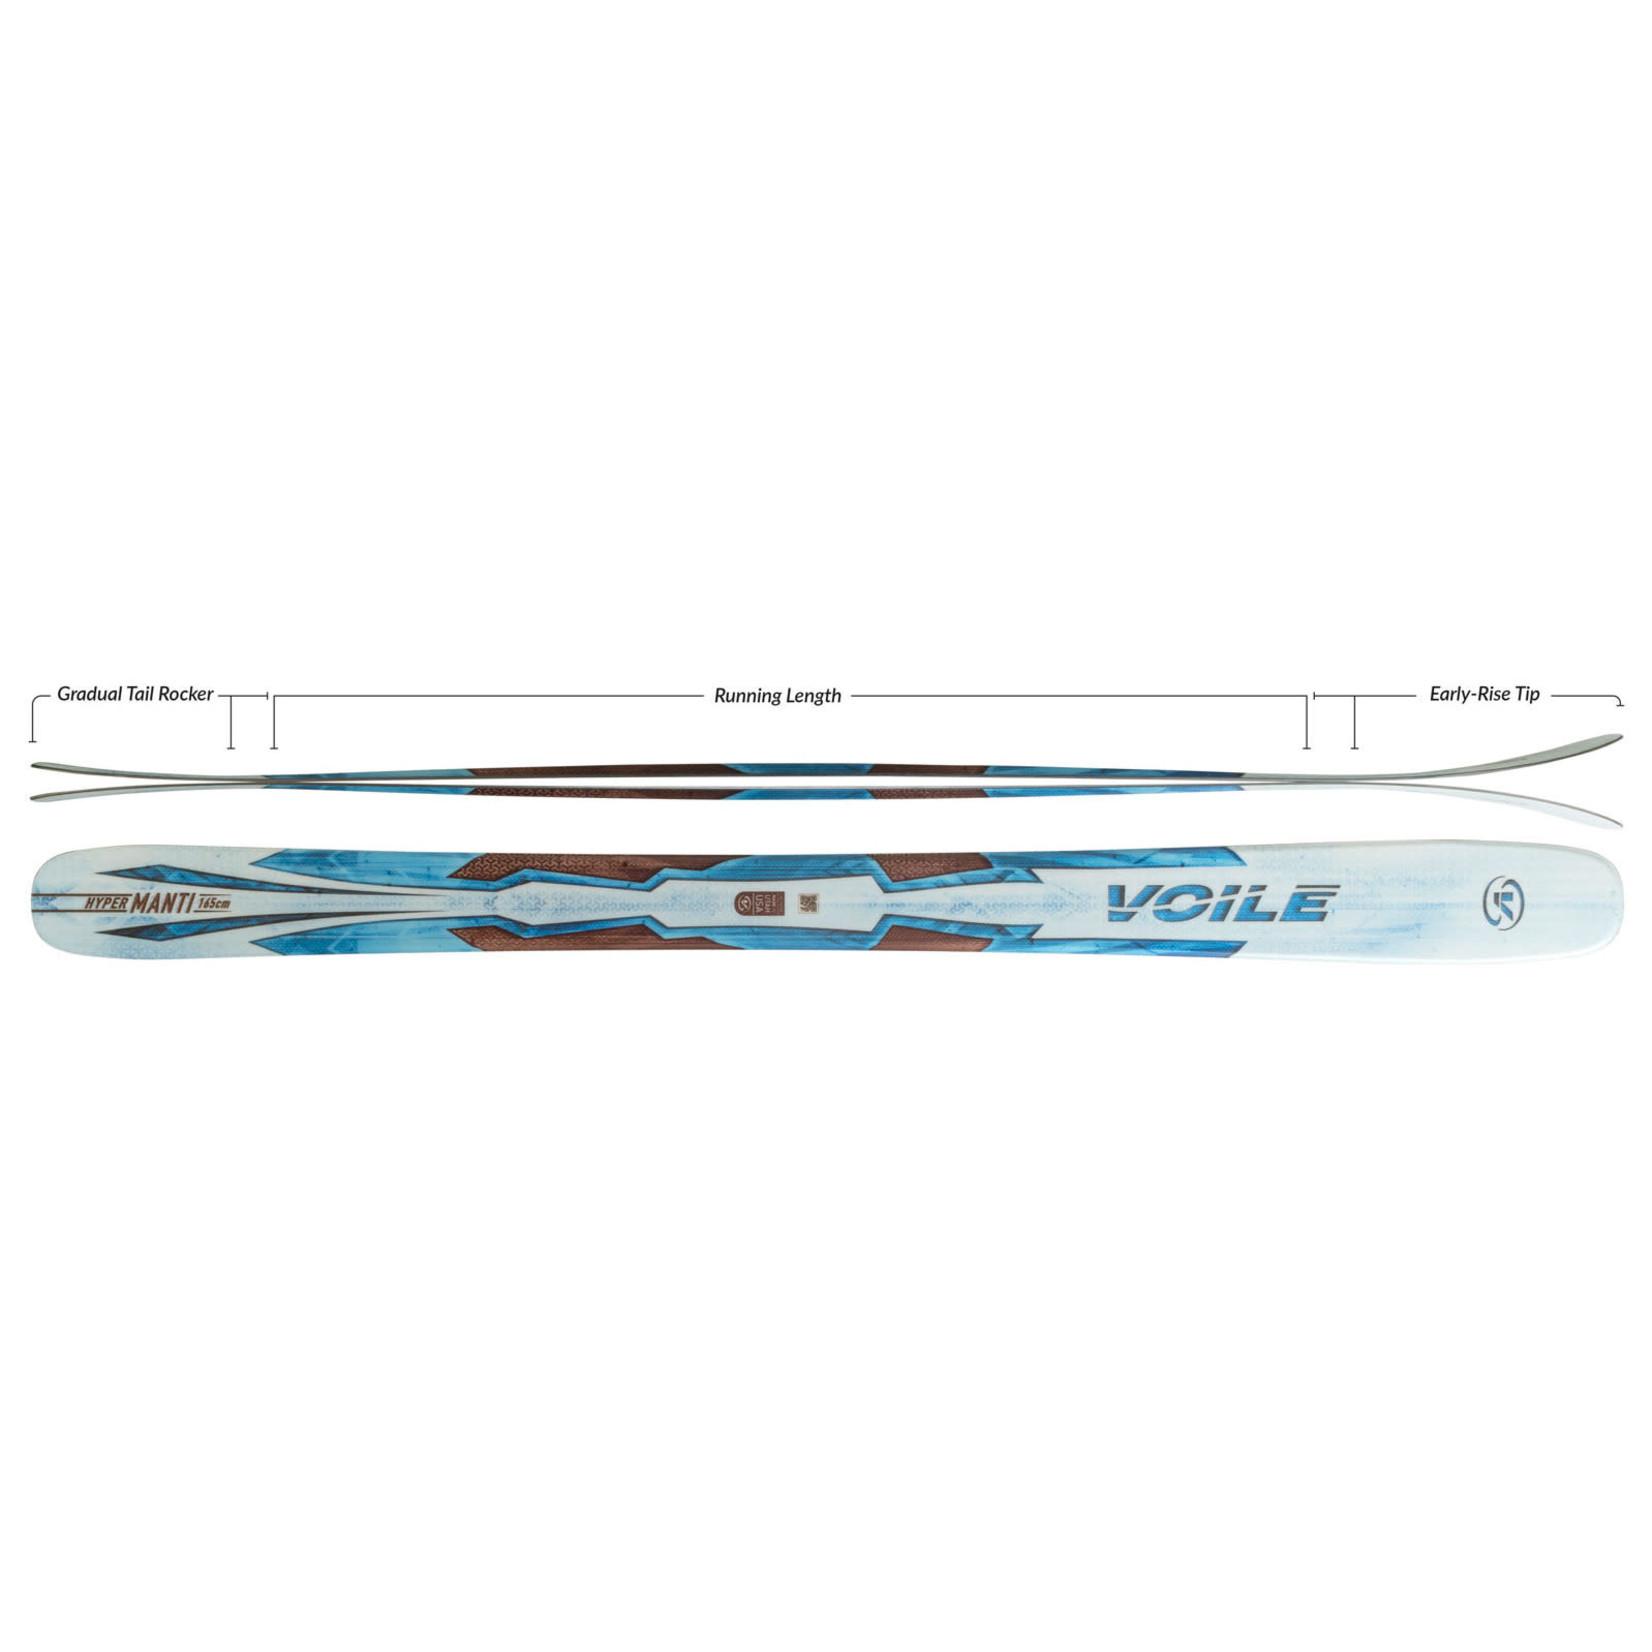 Voile Women's Hyper Manti Skis